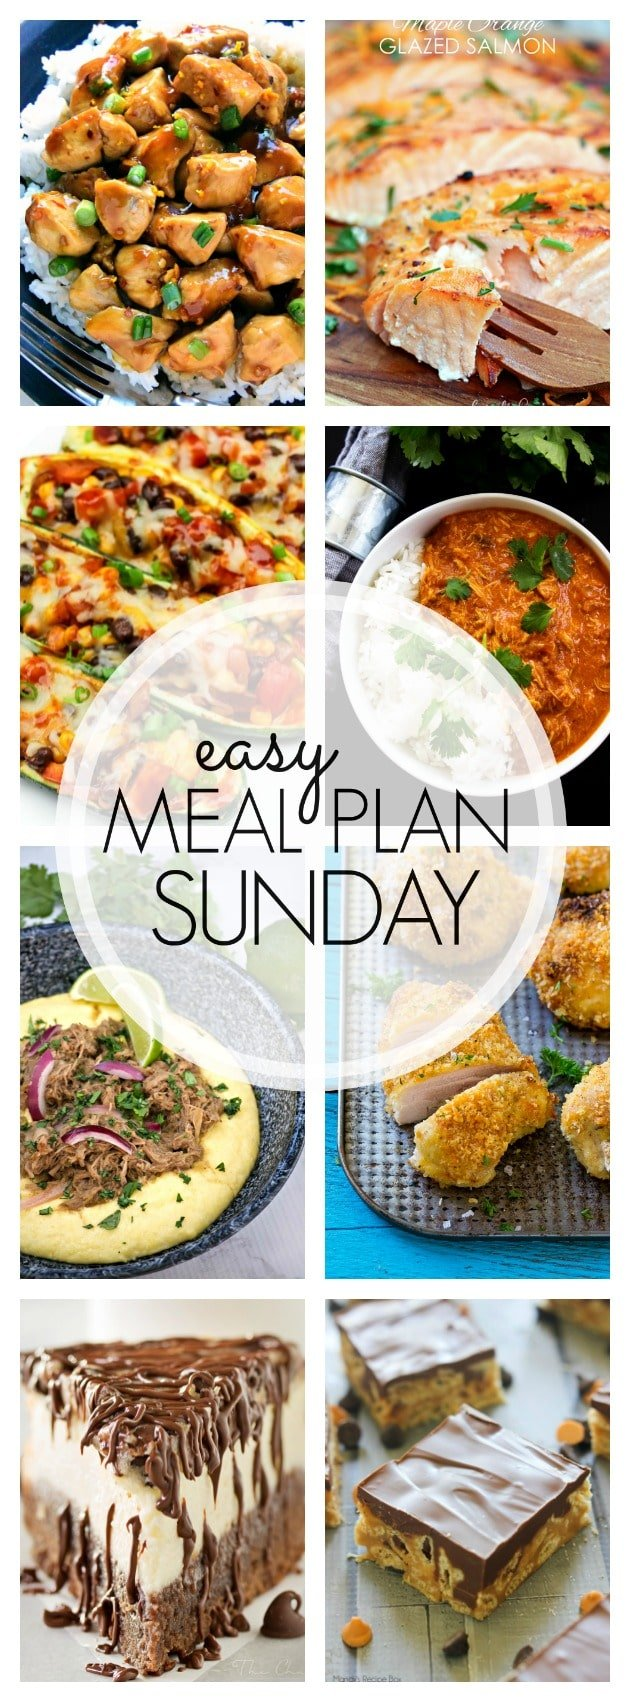 Easy Meal Plan Sunday - Week 80